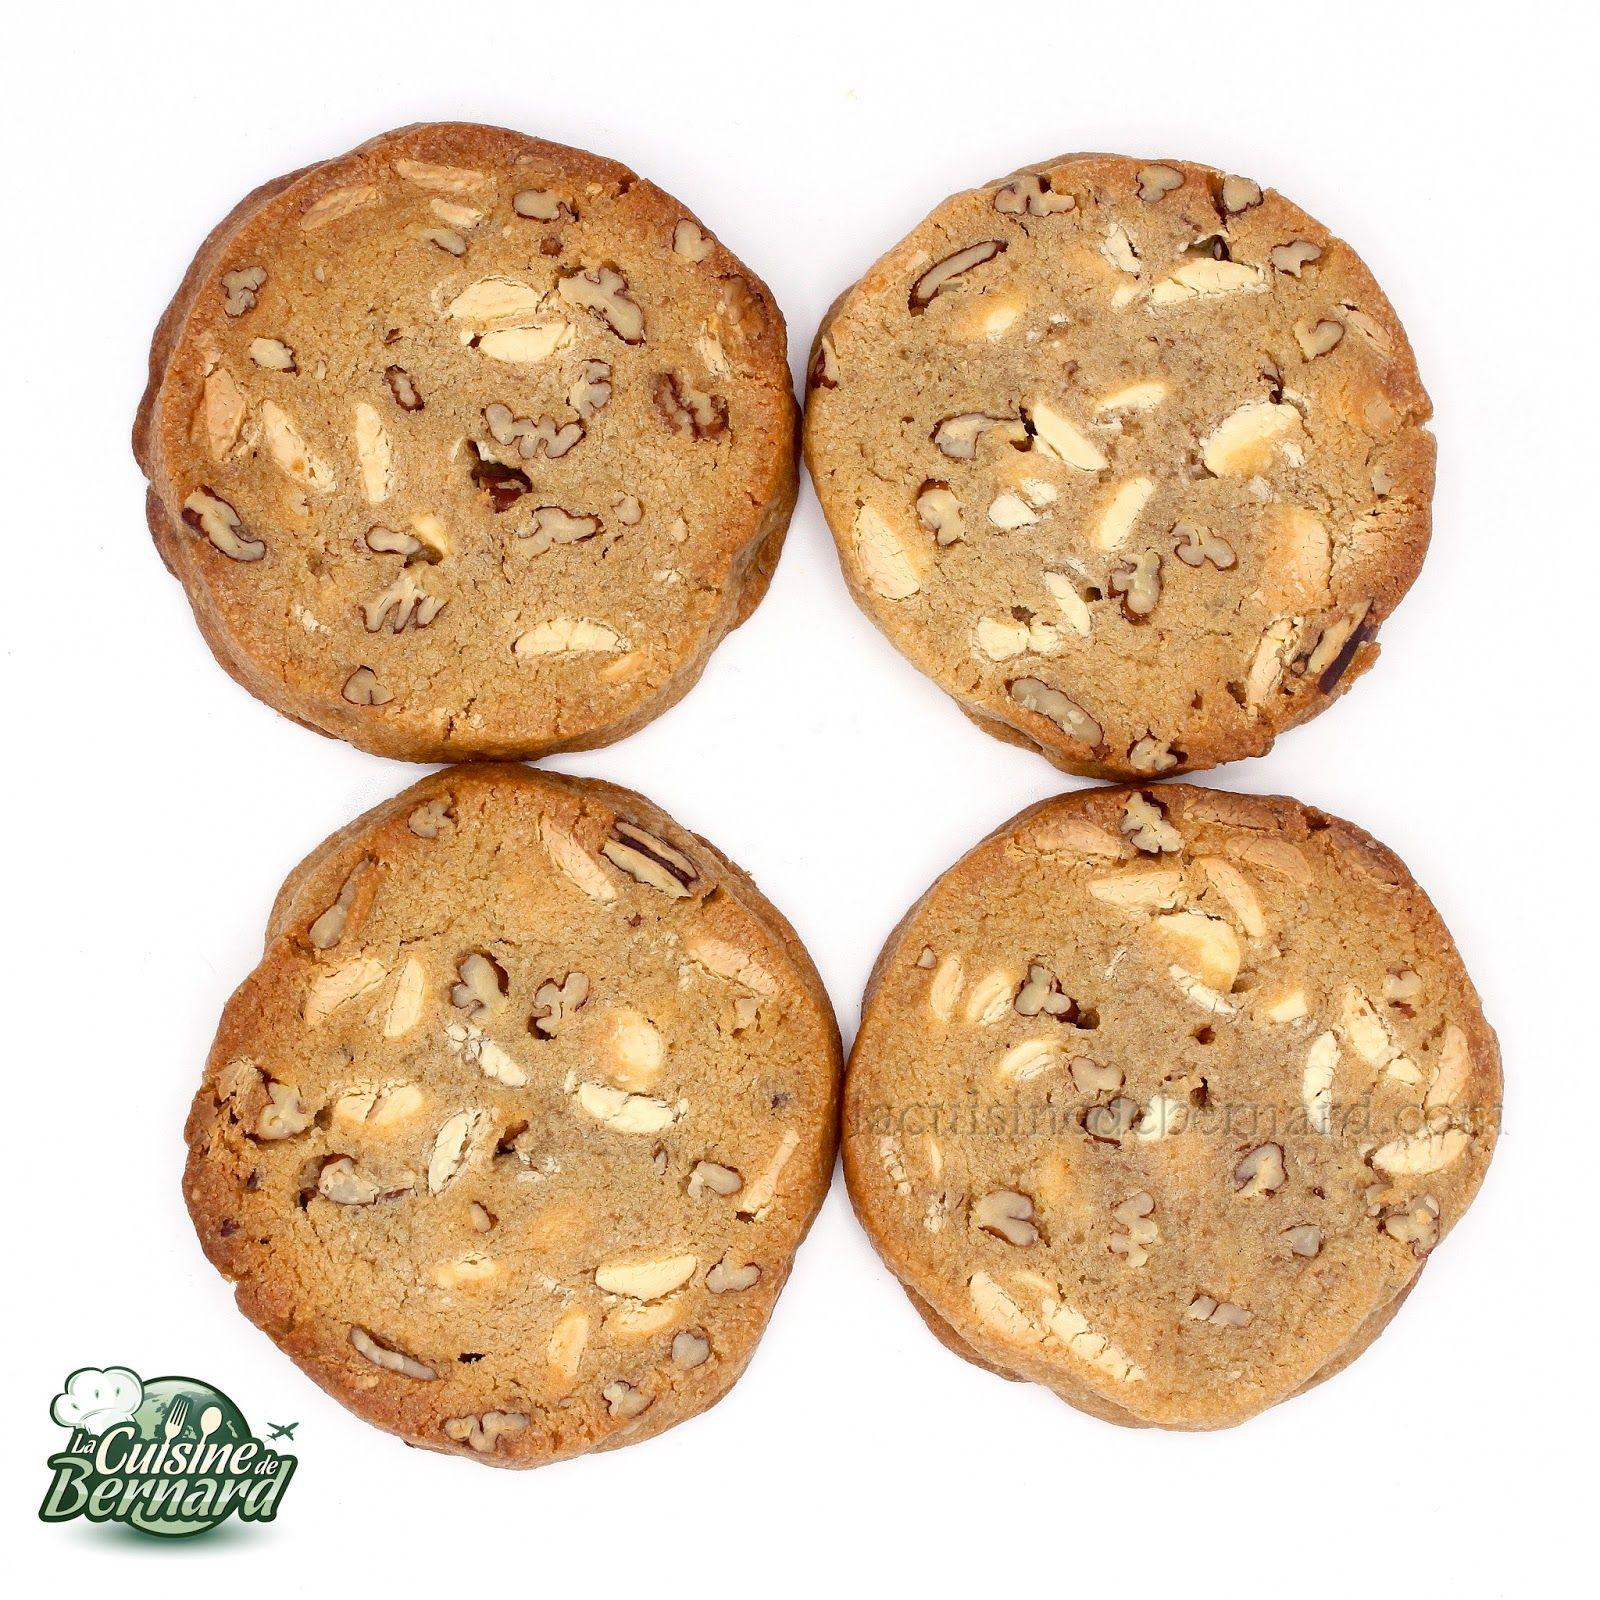 La Cuisine de Bernard  Cookies au chocolat blanc et noix de pcan  Recettes cookies  Cookies